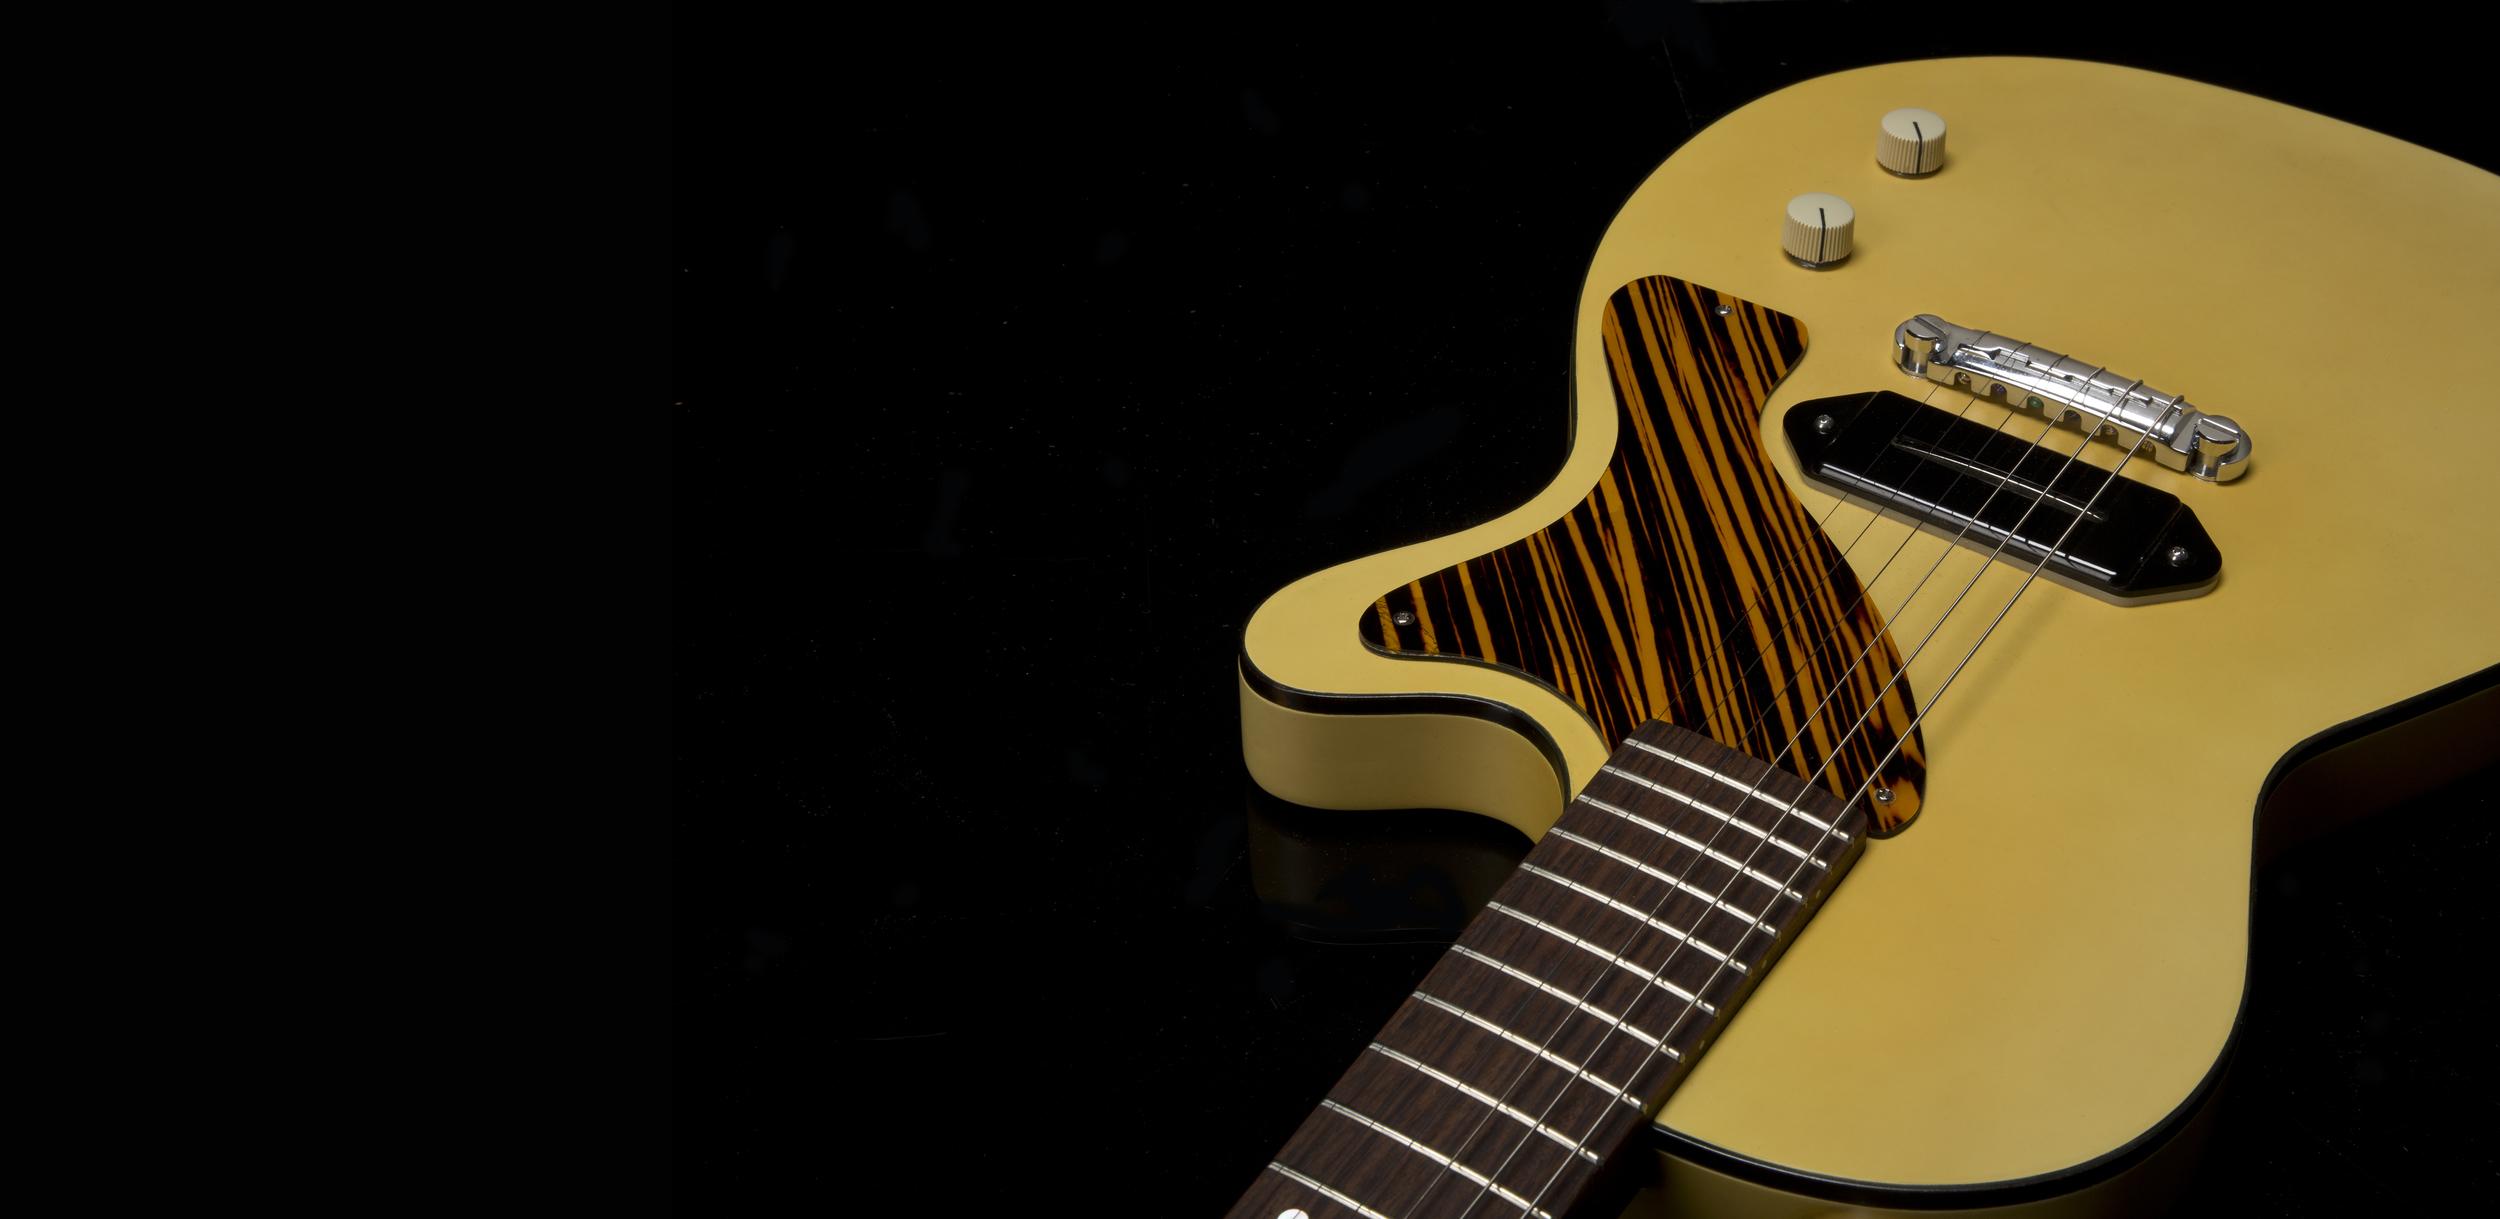 Yellow Pinto Forshortened.jpg